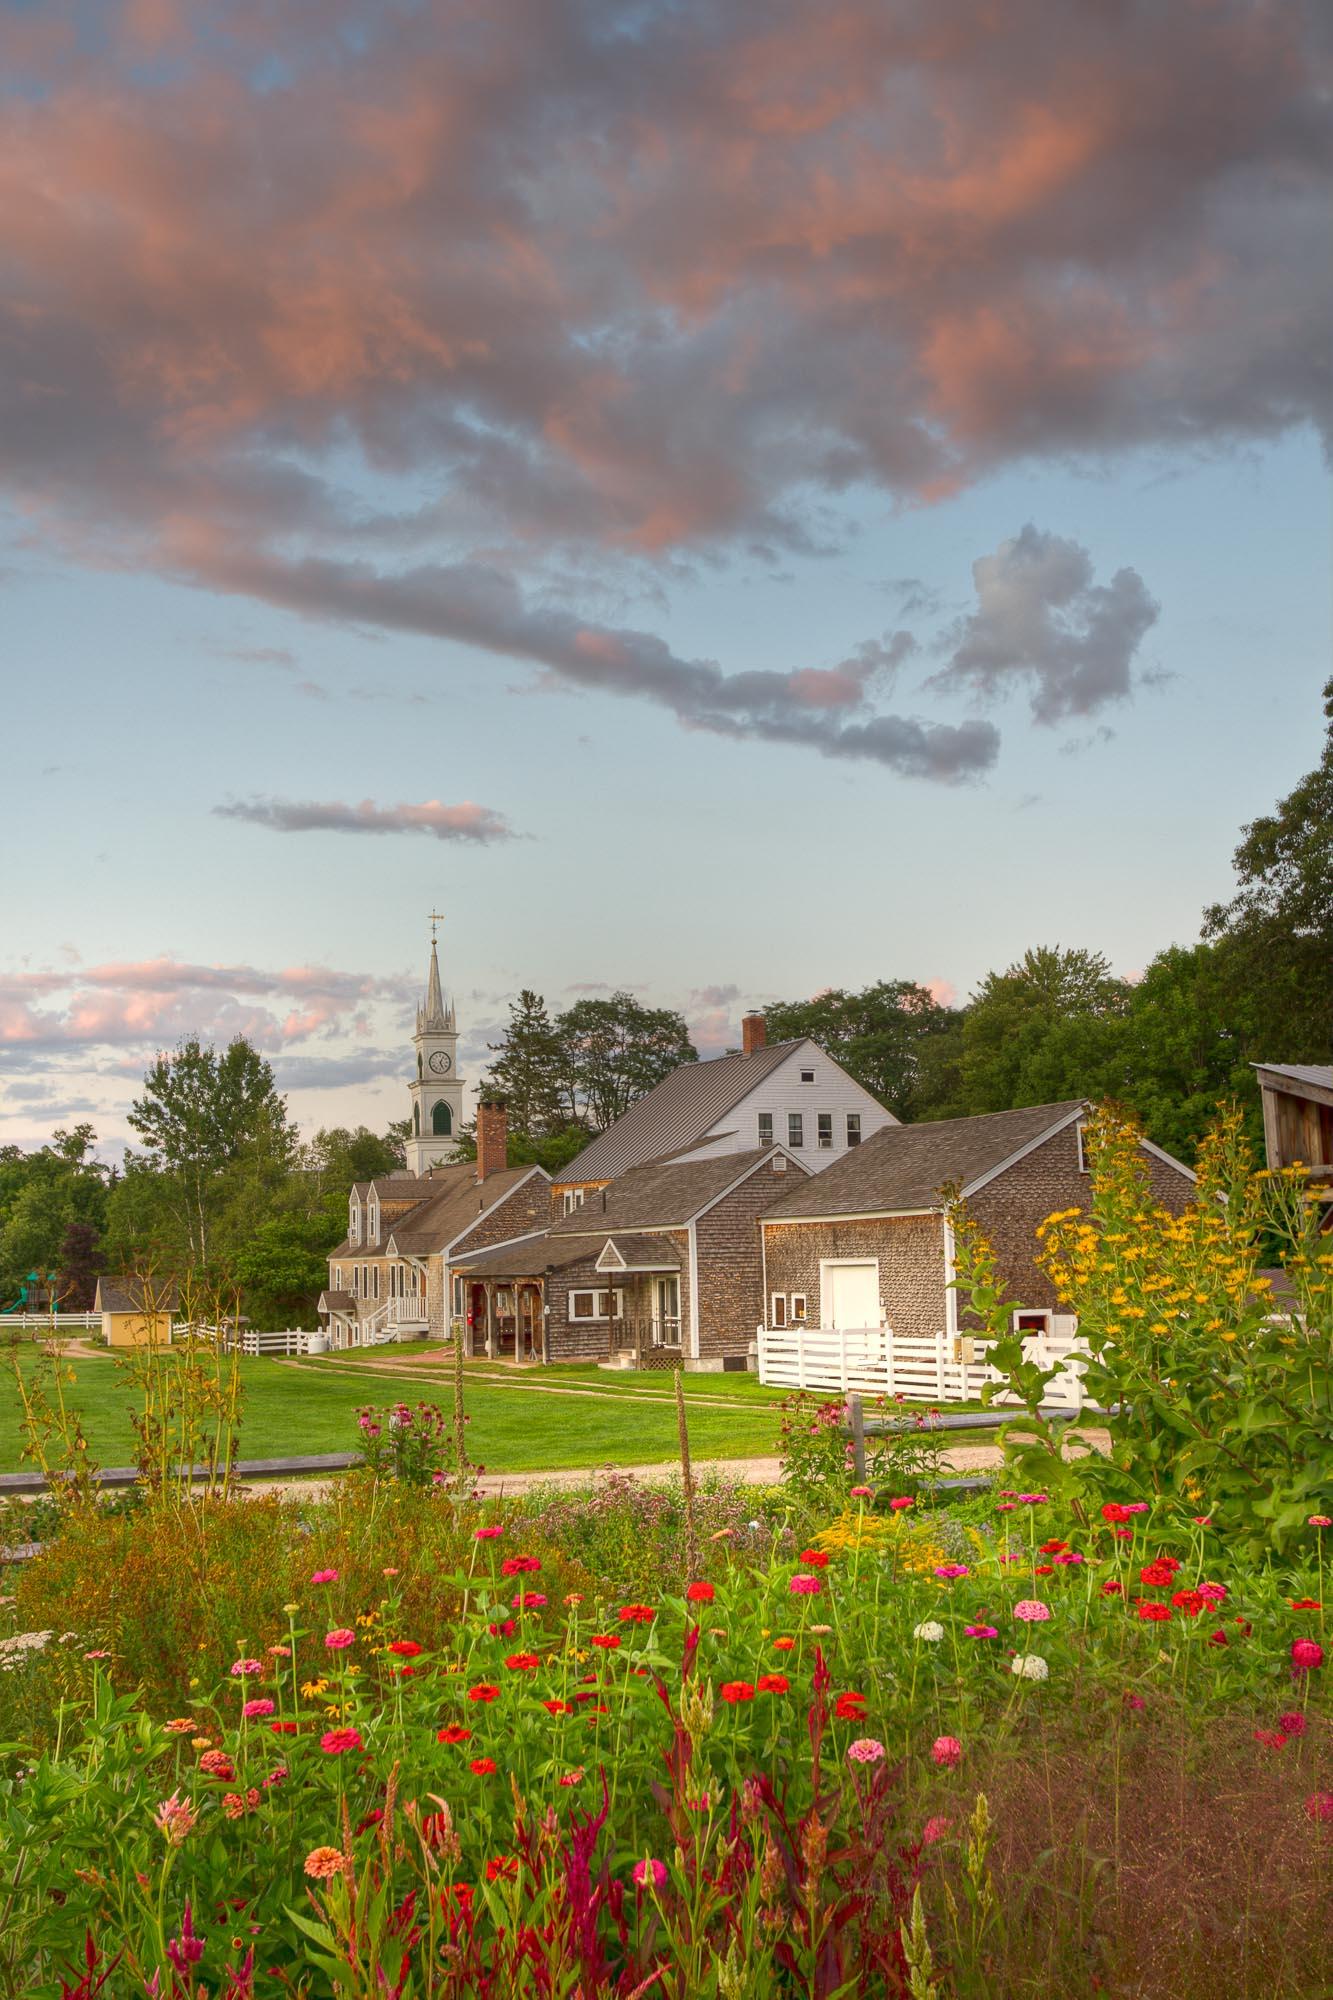 Remick Farm in Bloom